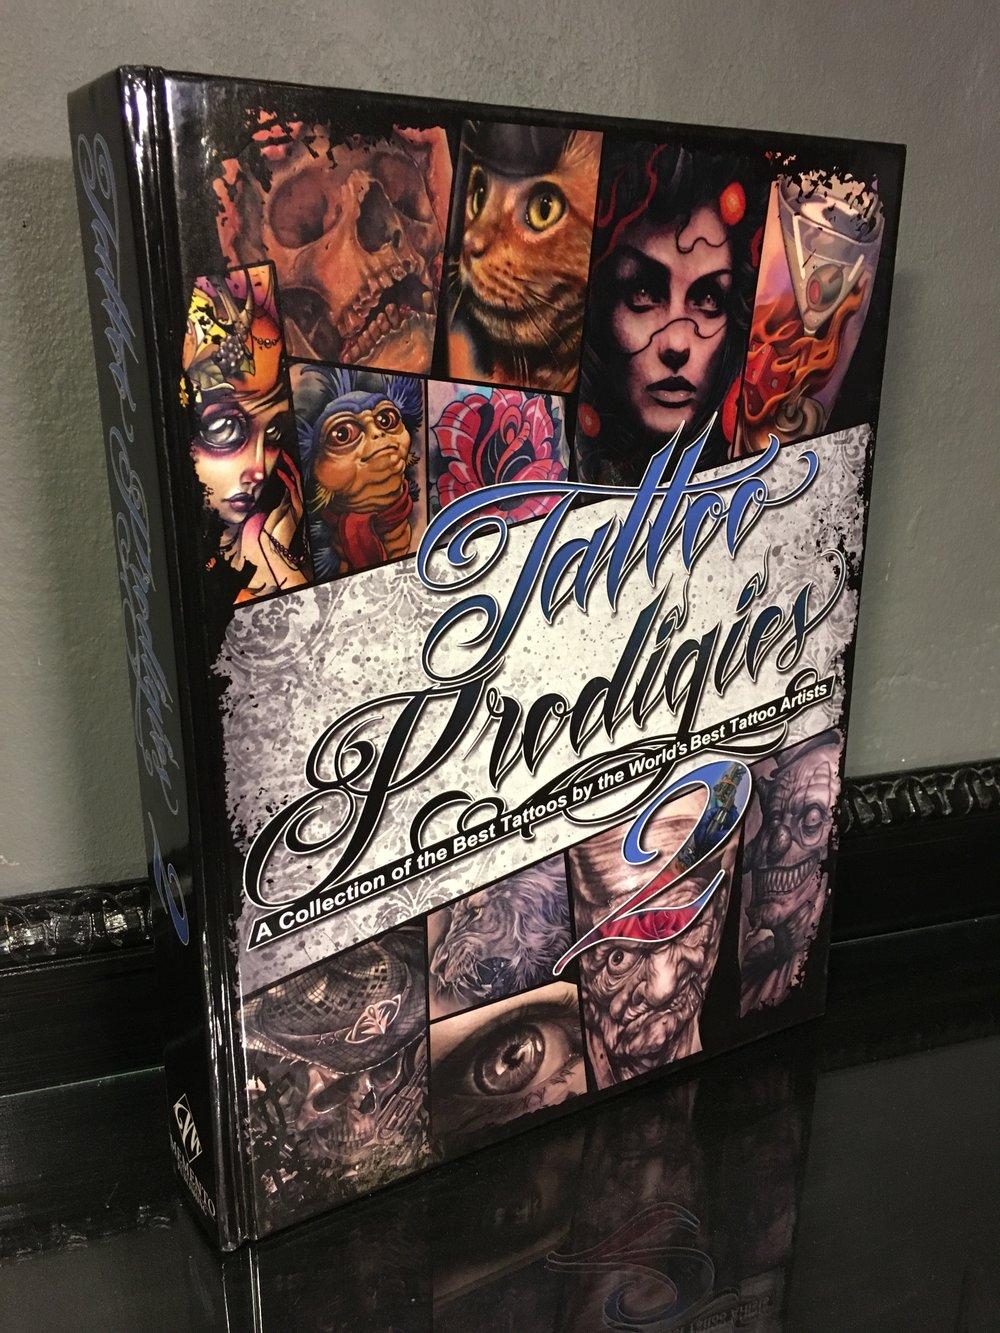 Tattoo Prodigies 2 (Cover)